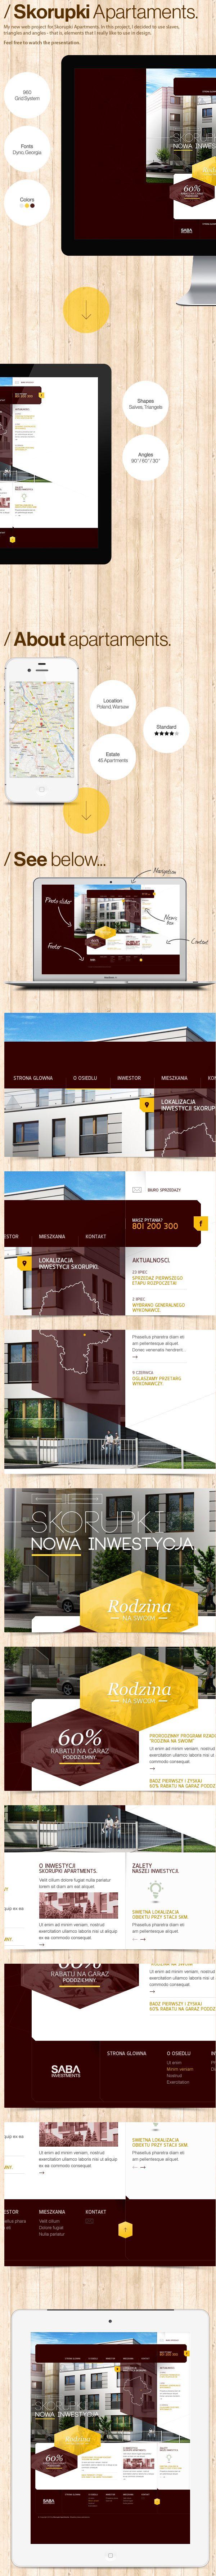 Exclusive Apartments by Adam Rudzki, via Behance